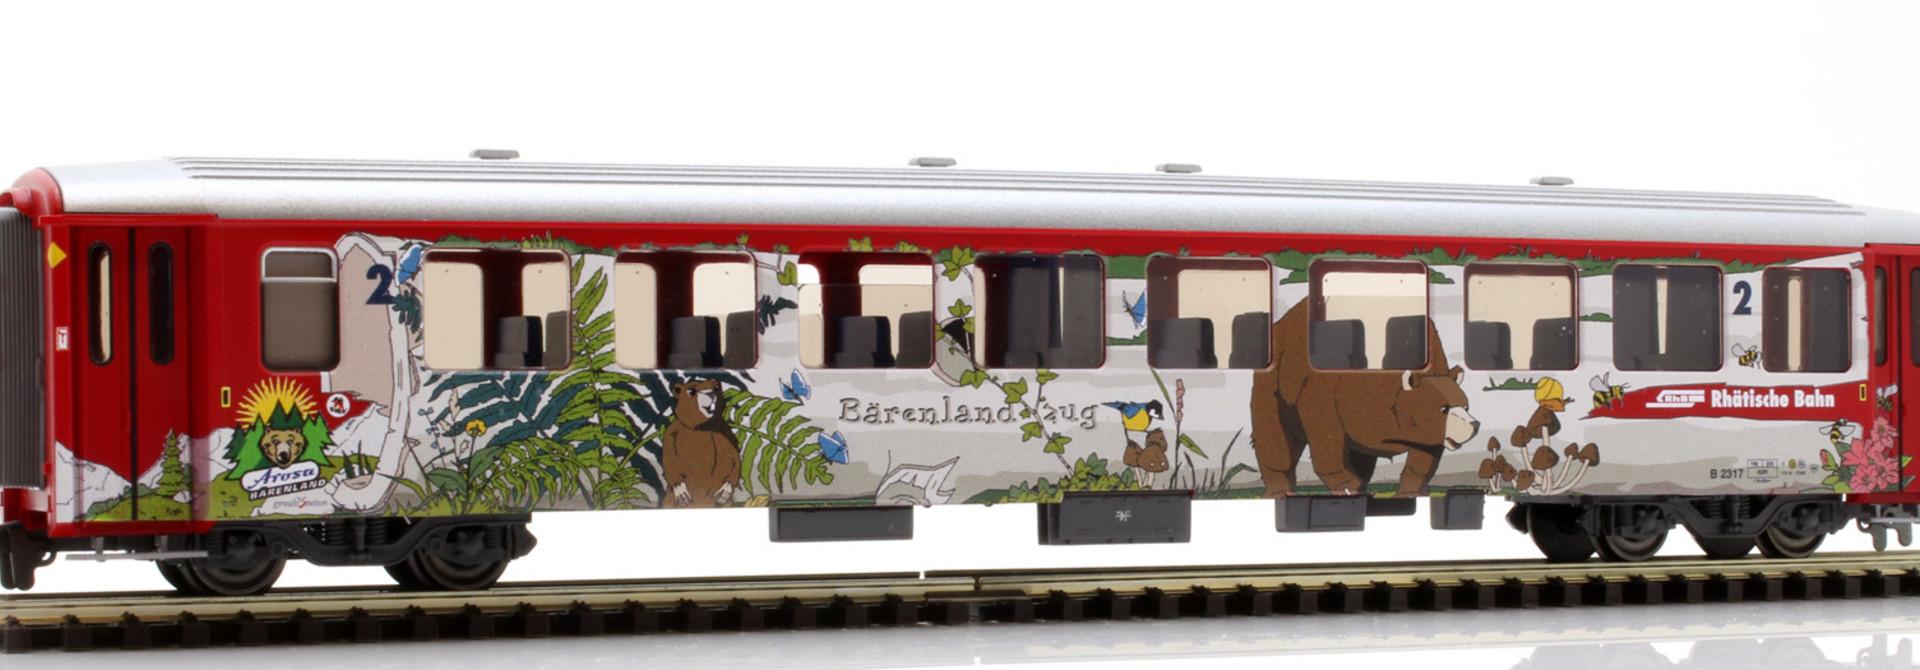 "3253147 RhB B 2317 EW I ""Bärenland Arosa"""